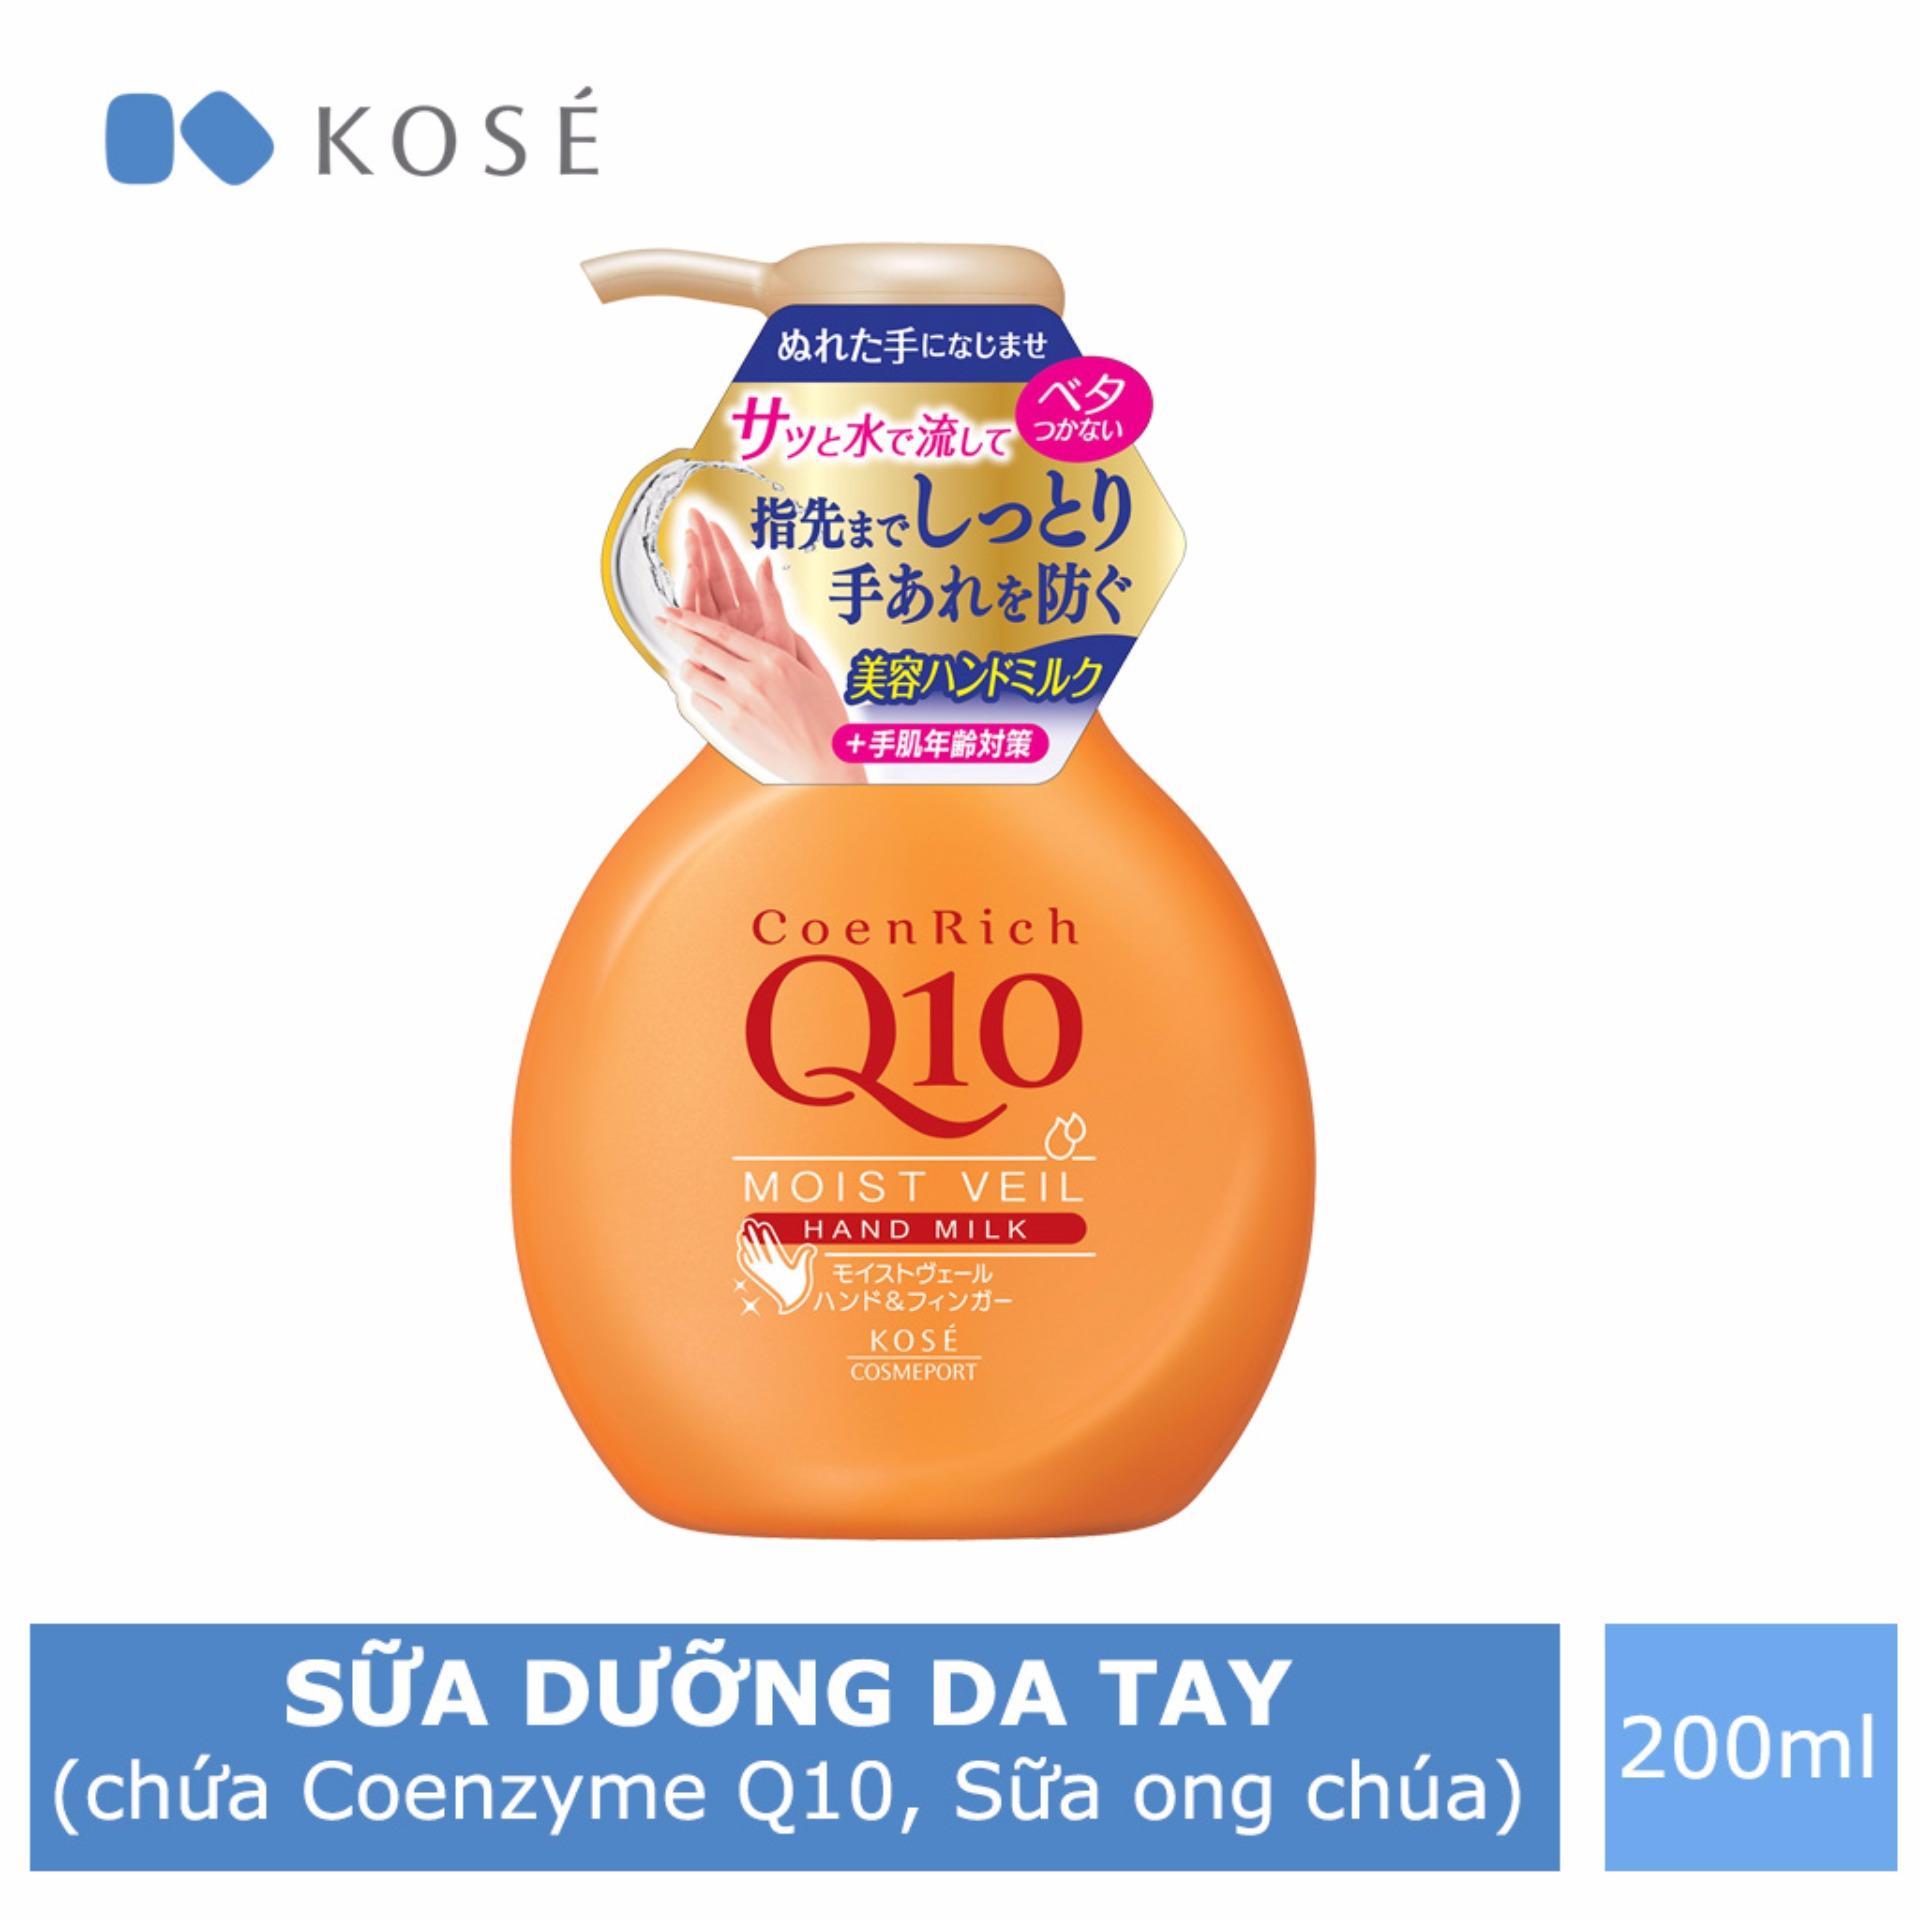 Cửa Hàng Sữa Dưỡng Chăm Soc Da Tay Kose Cosmeport Coenrich Moist Veil Hand Milk 200Ml Trực Tuyến